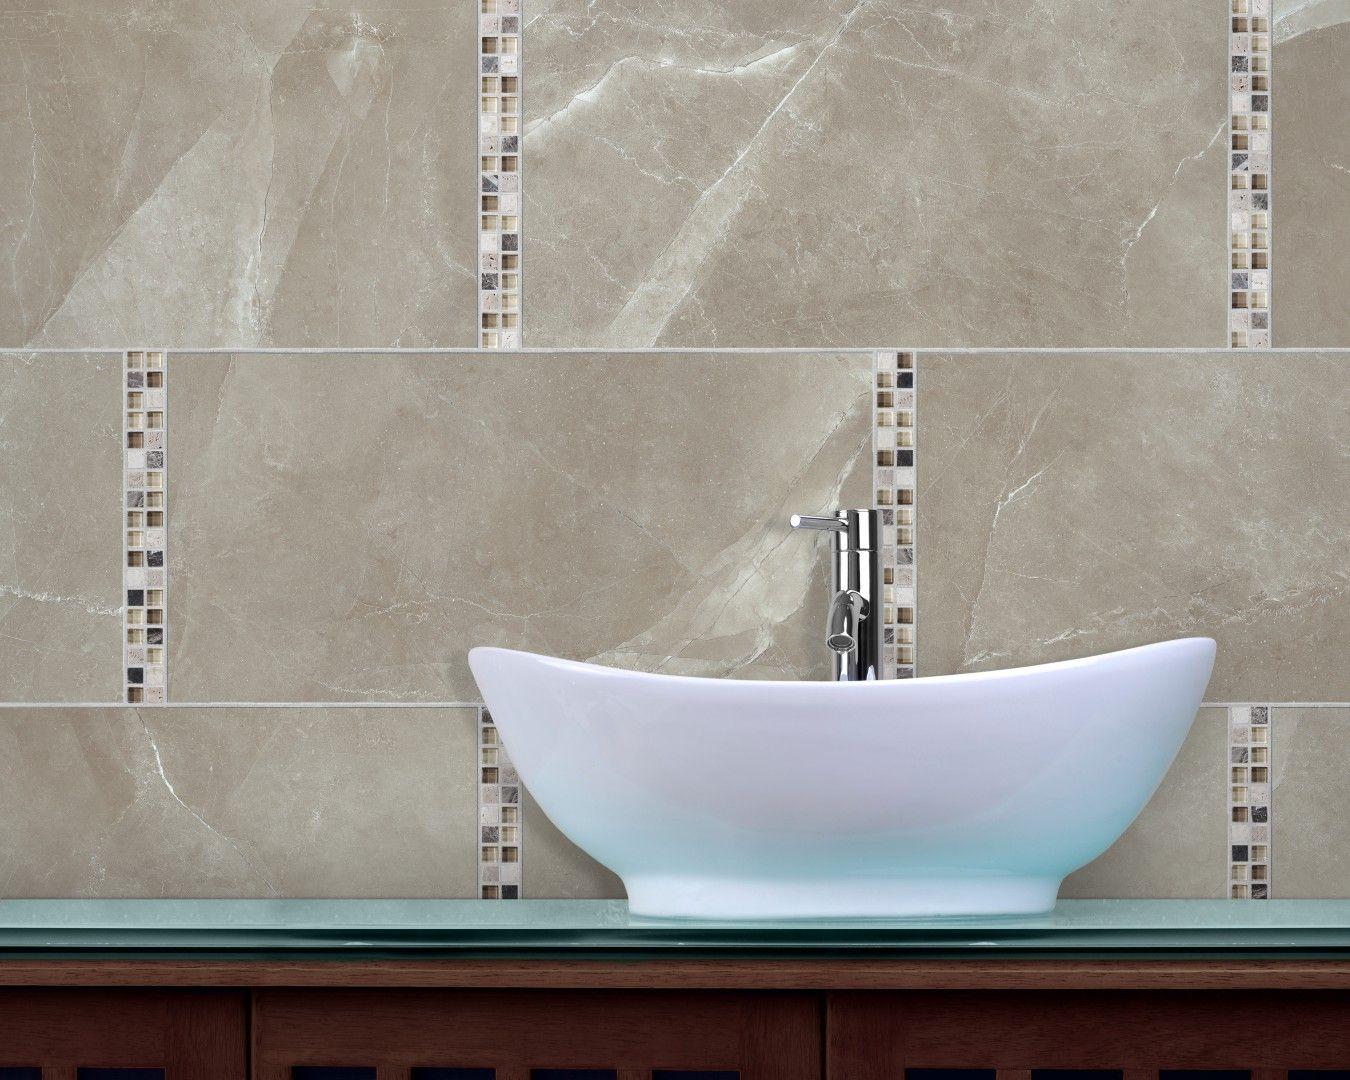 Pulpis Moca High Definition Porcelain Tile Anatolia Tile